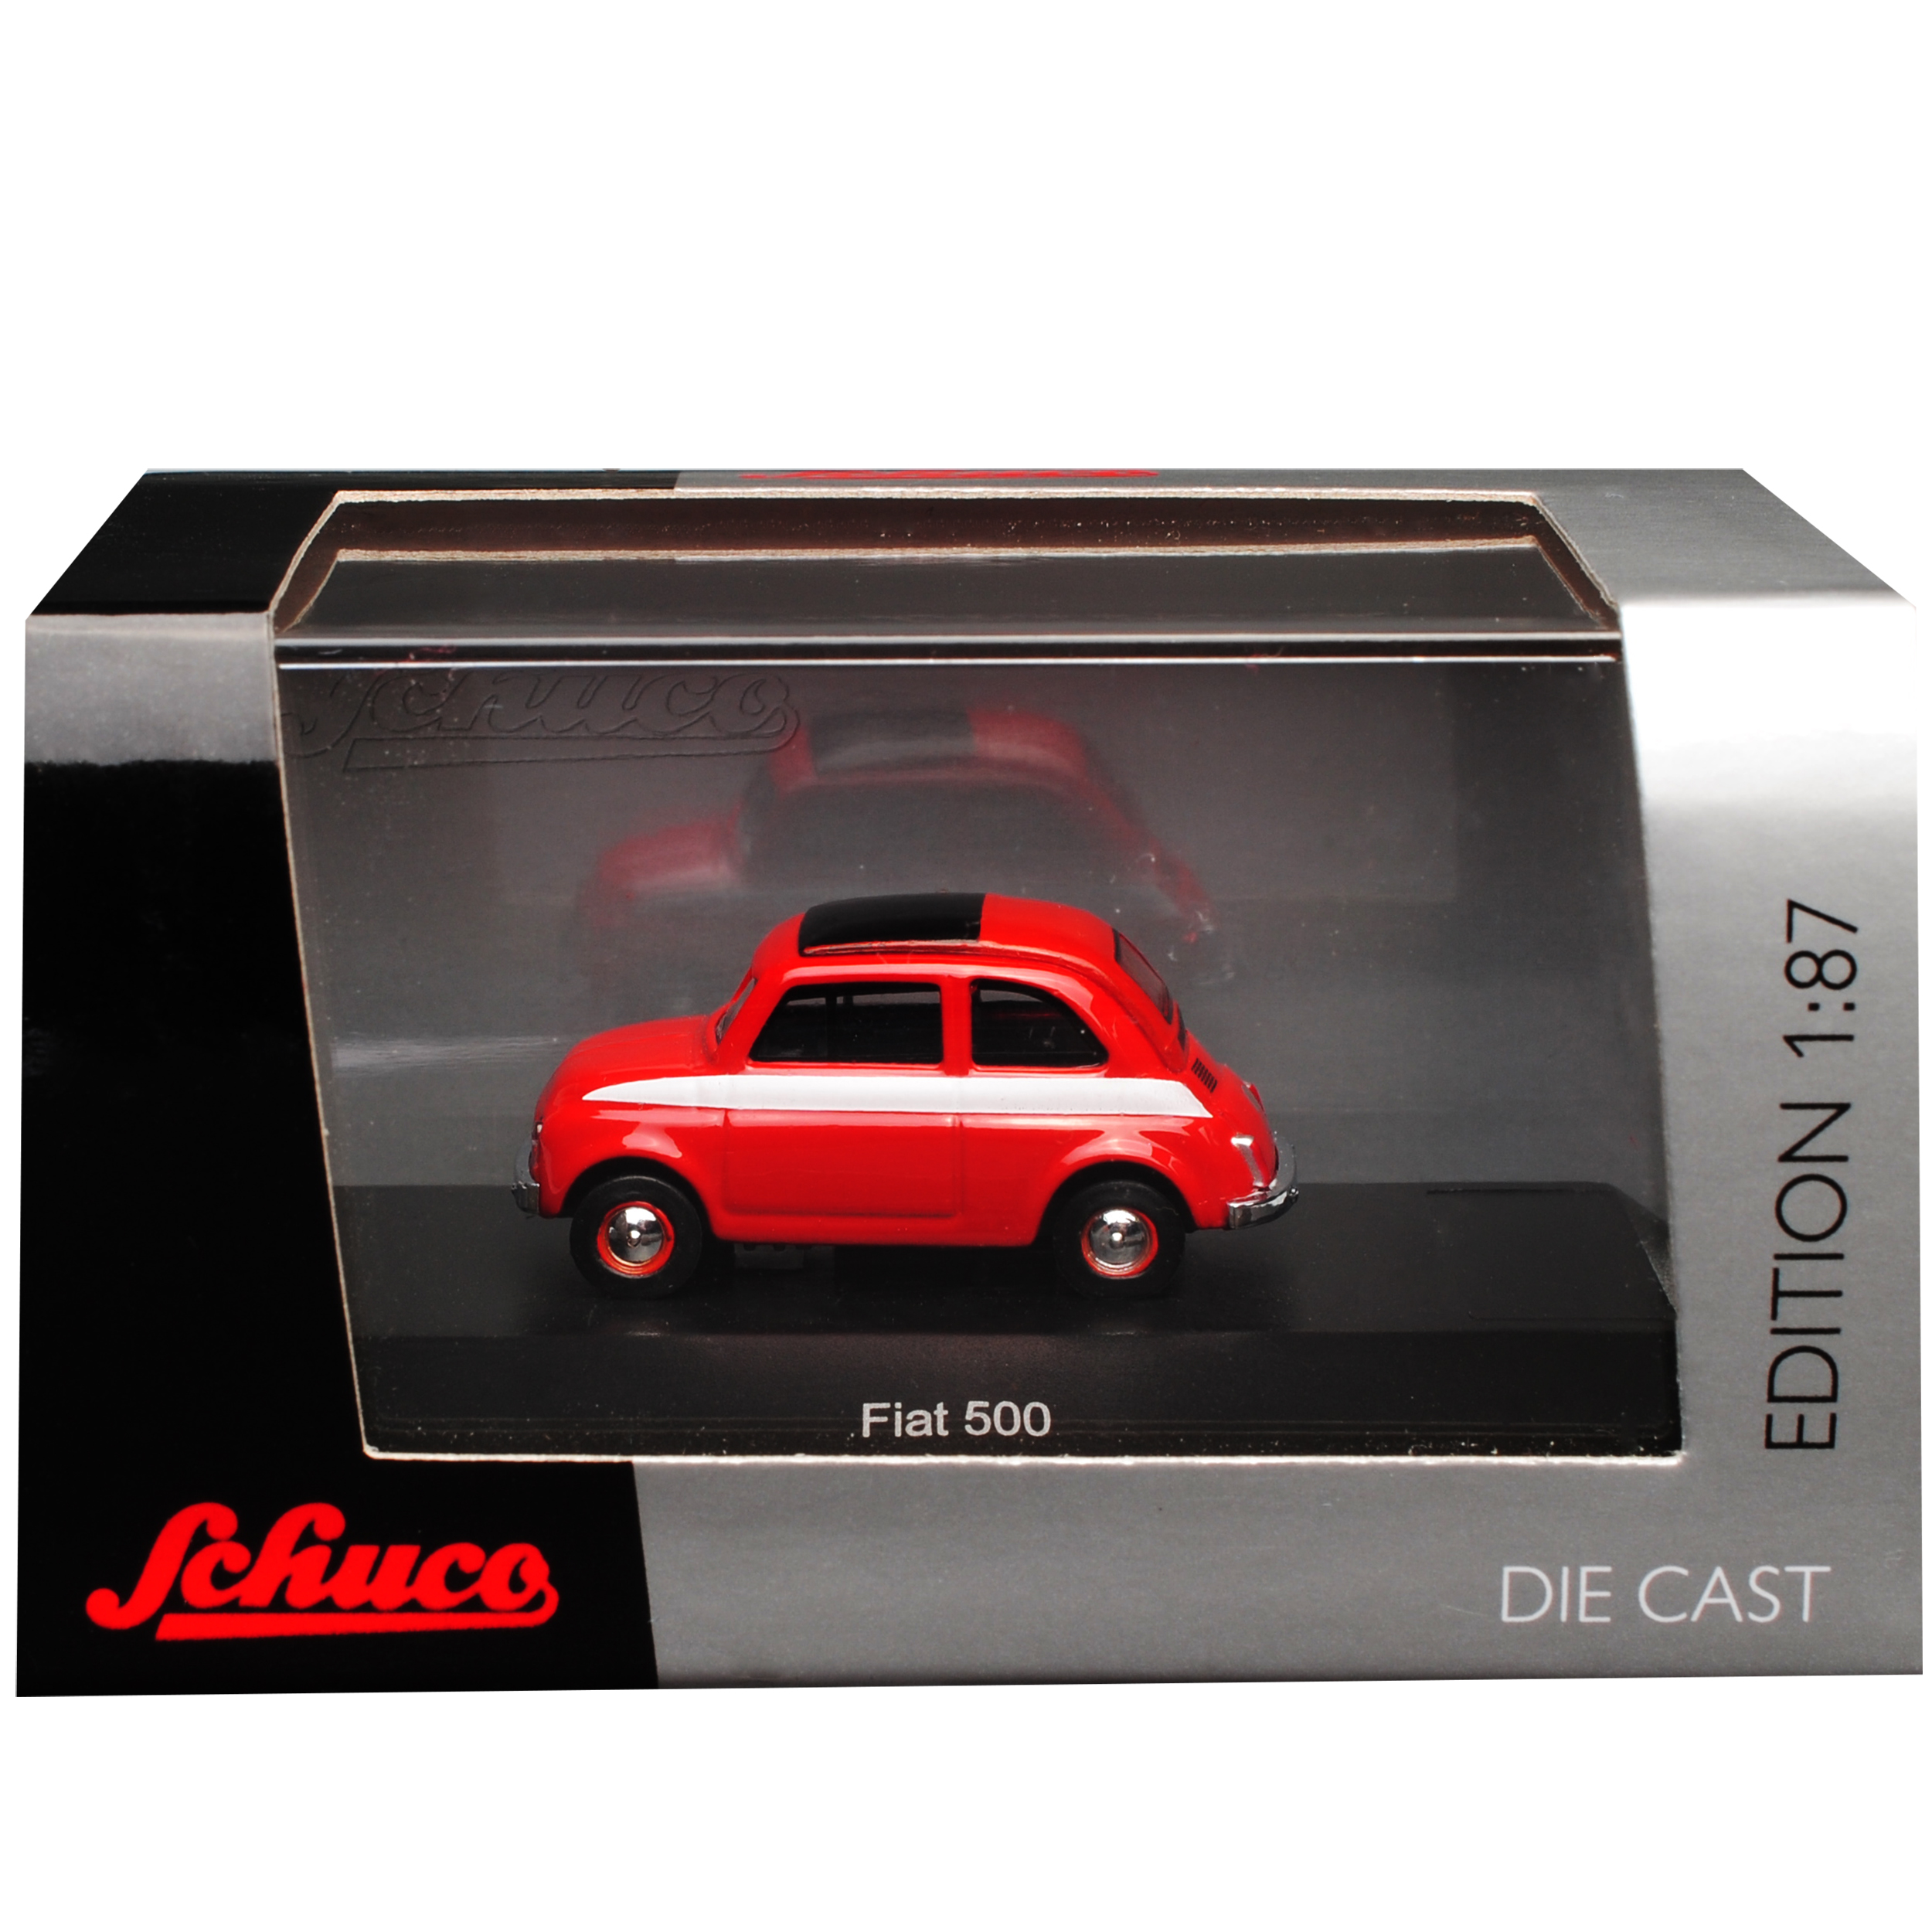 Fiat 500 Klassik Rot Ur Modell ab 1957 H0 1//87 Schuco Modell Auto mit oder ohn..